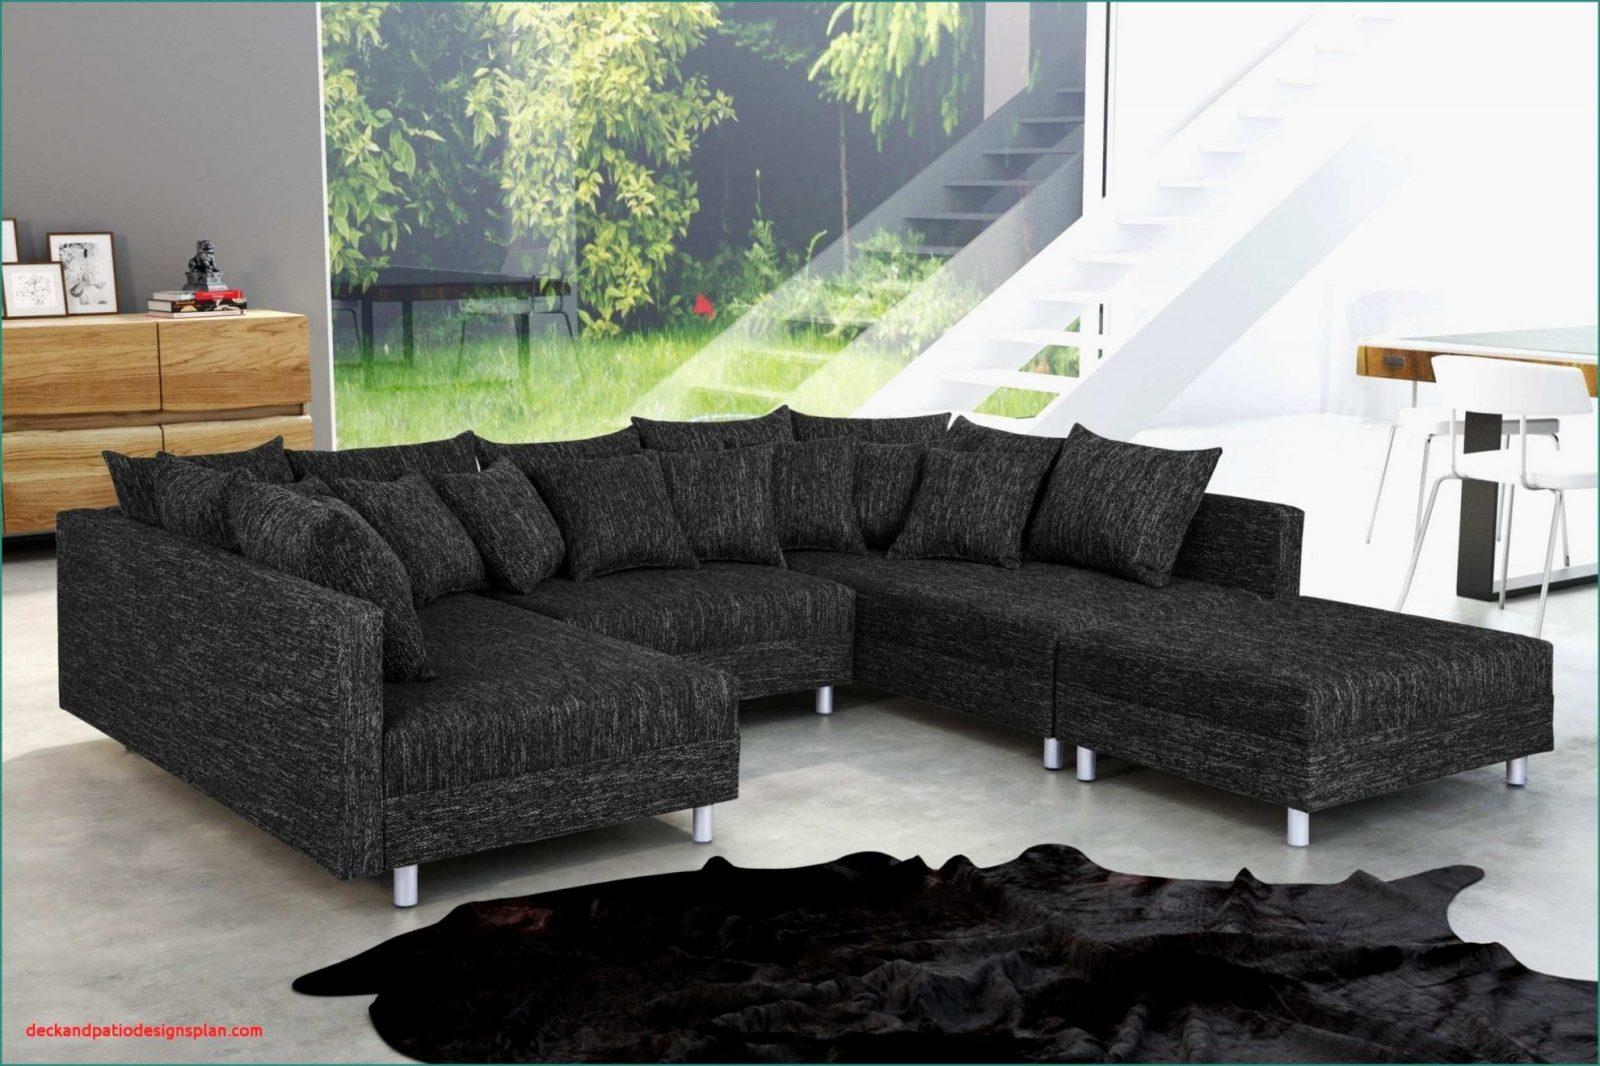 Möbel Boss Sofa Schlafsofa Möbel Boss  Thenewsleekness von Möbel Boss Big Sofa Bild